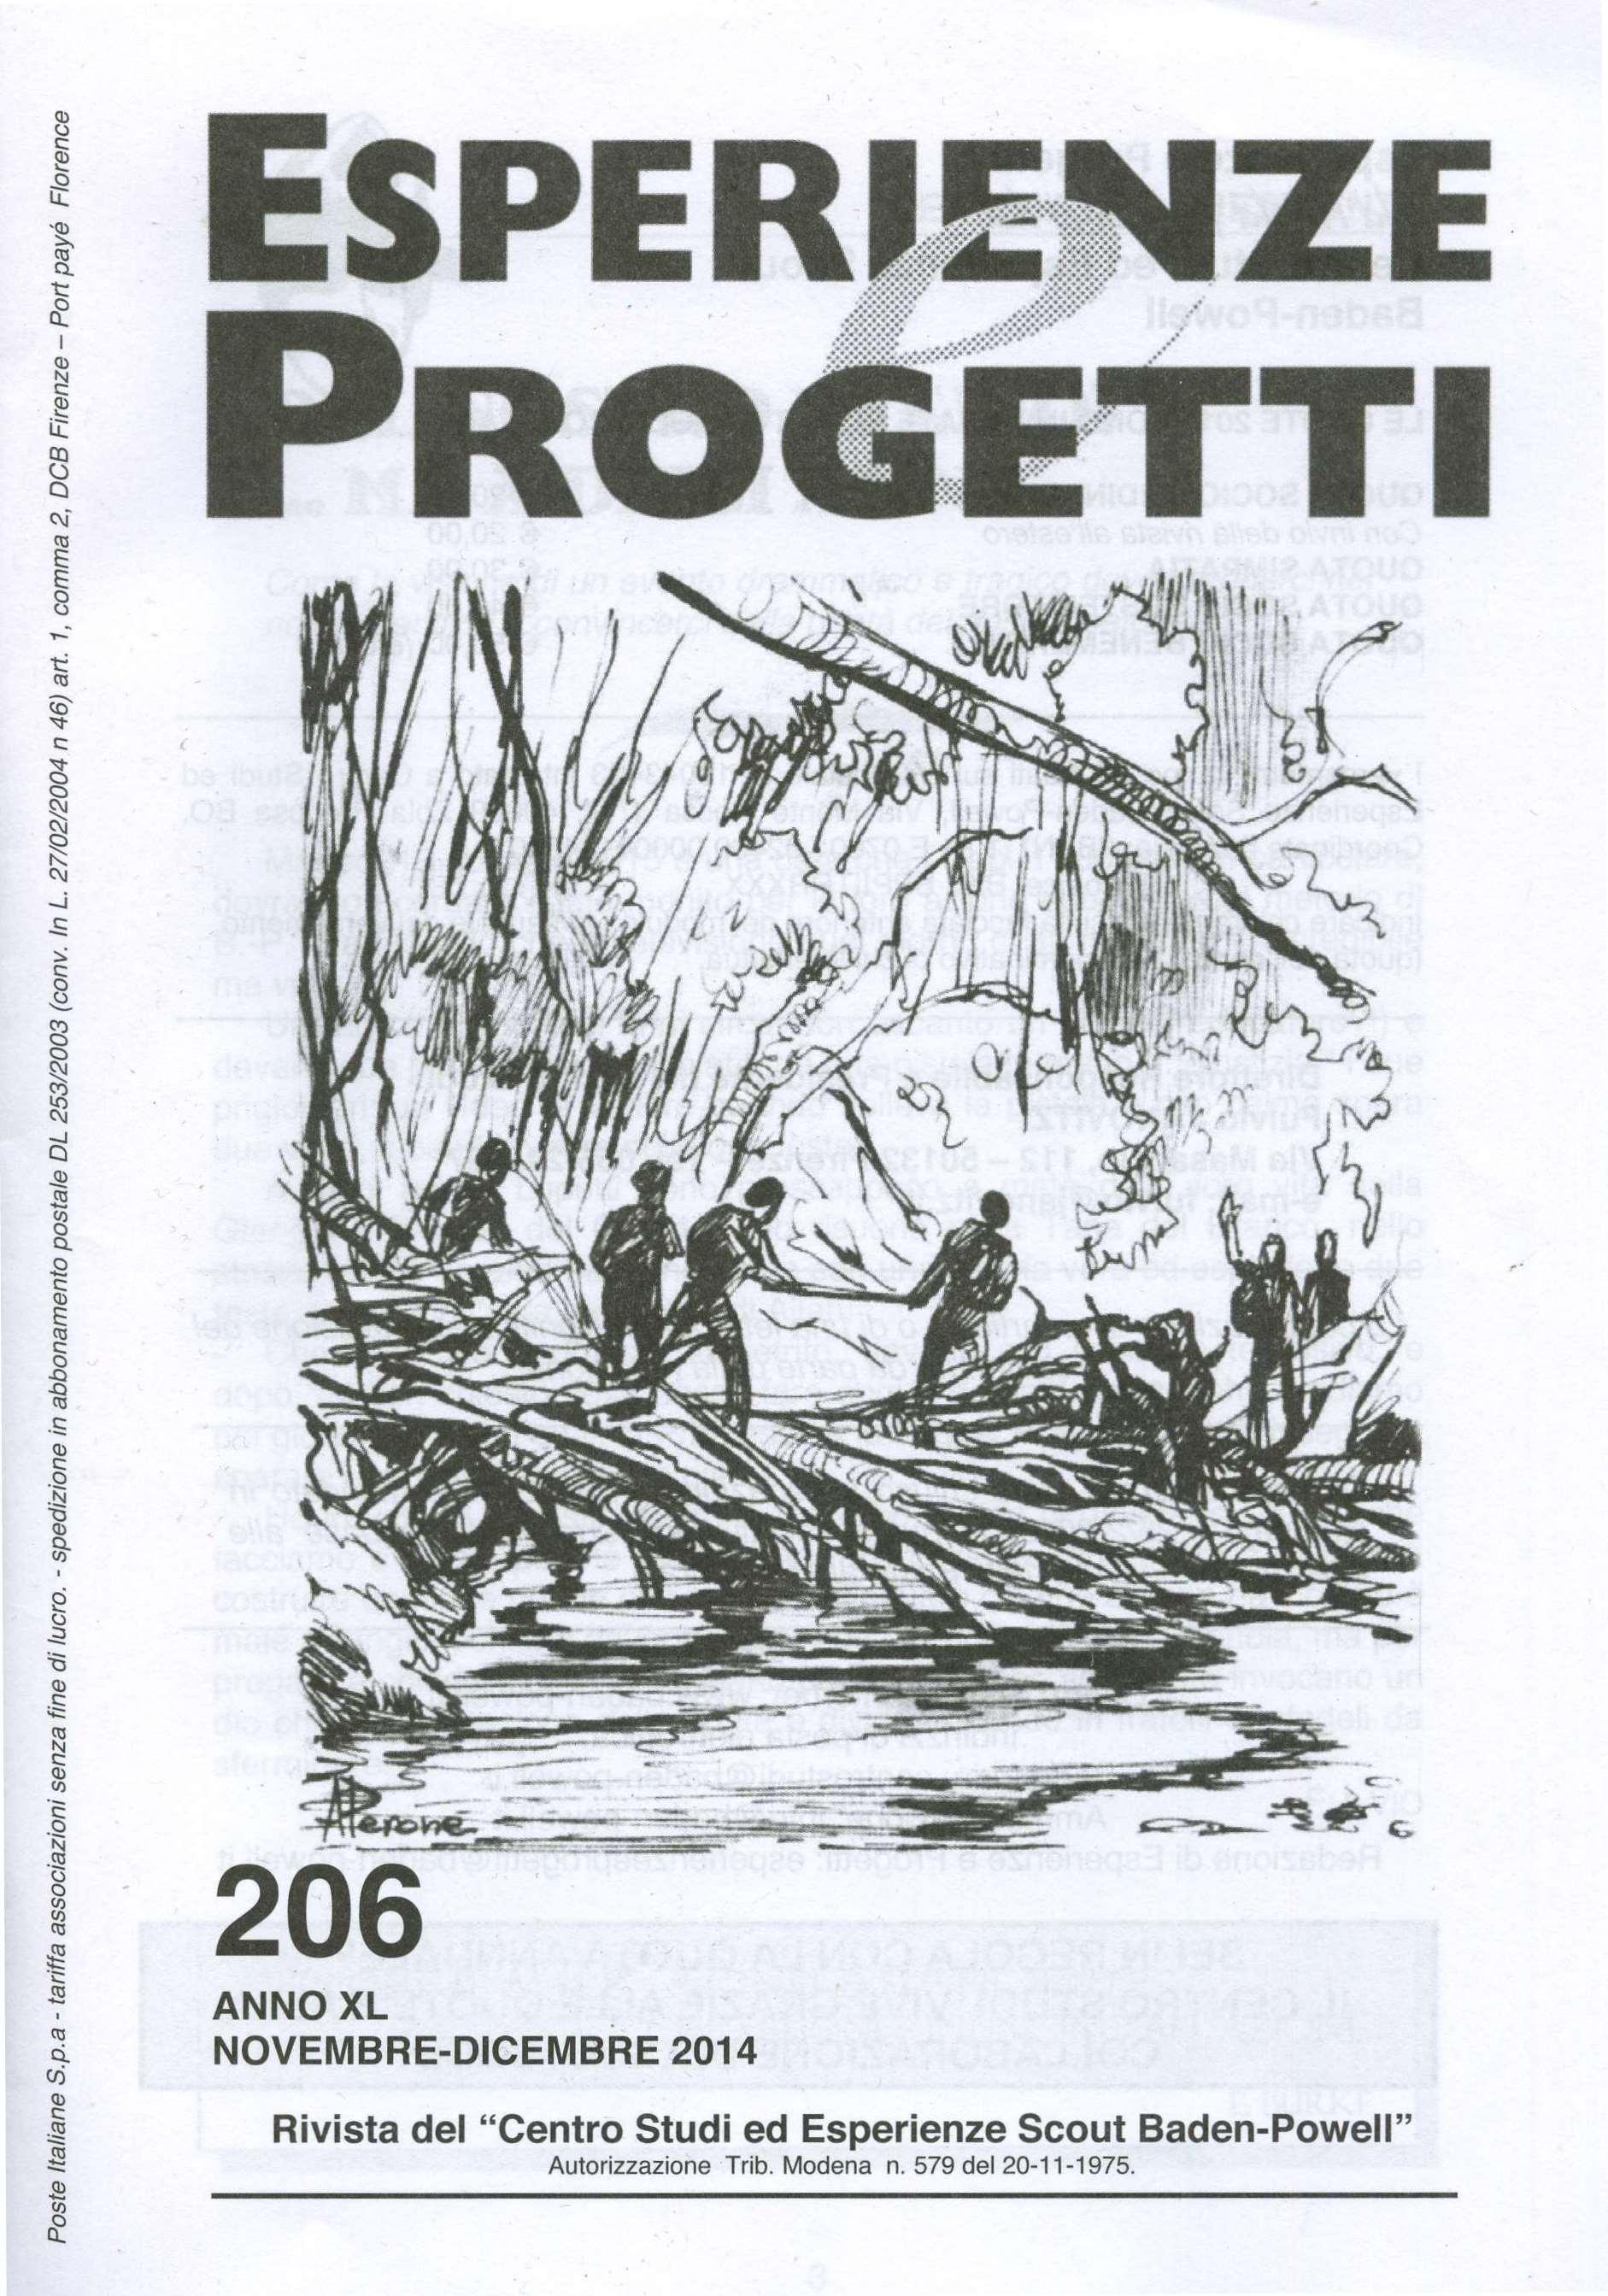 Esperienze & Progetti n. 206